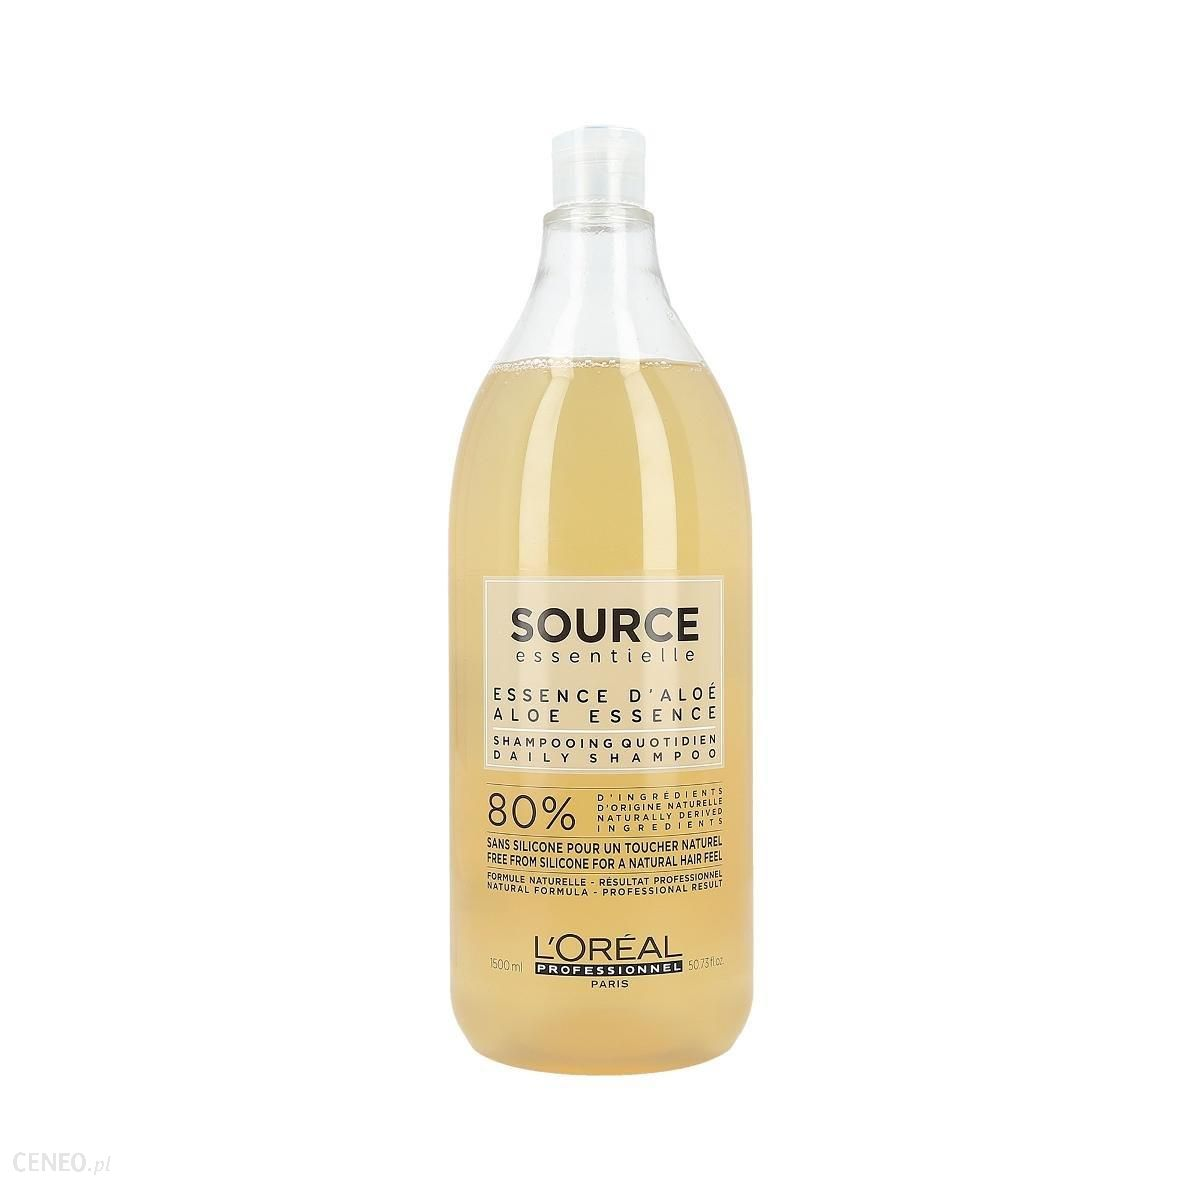 L'oreal Professionnel Source Essentielle szampon do włosów 1500ml